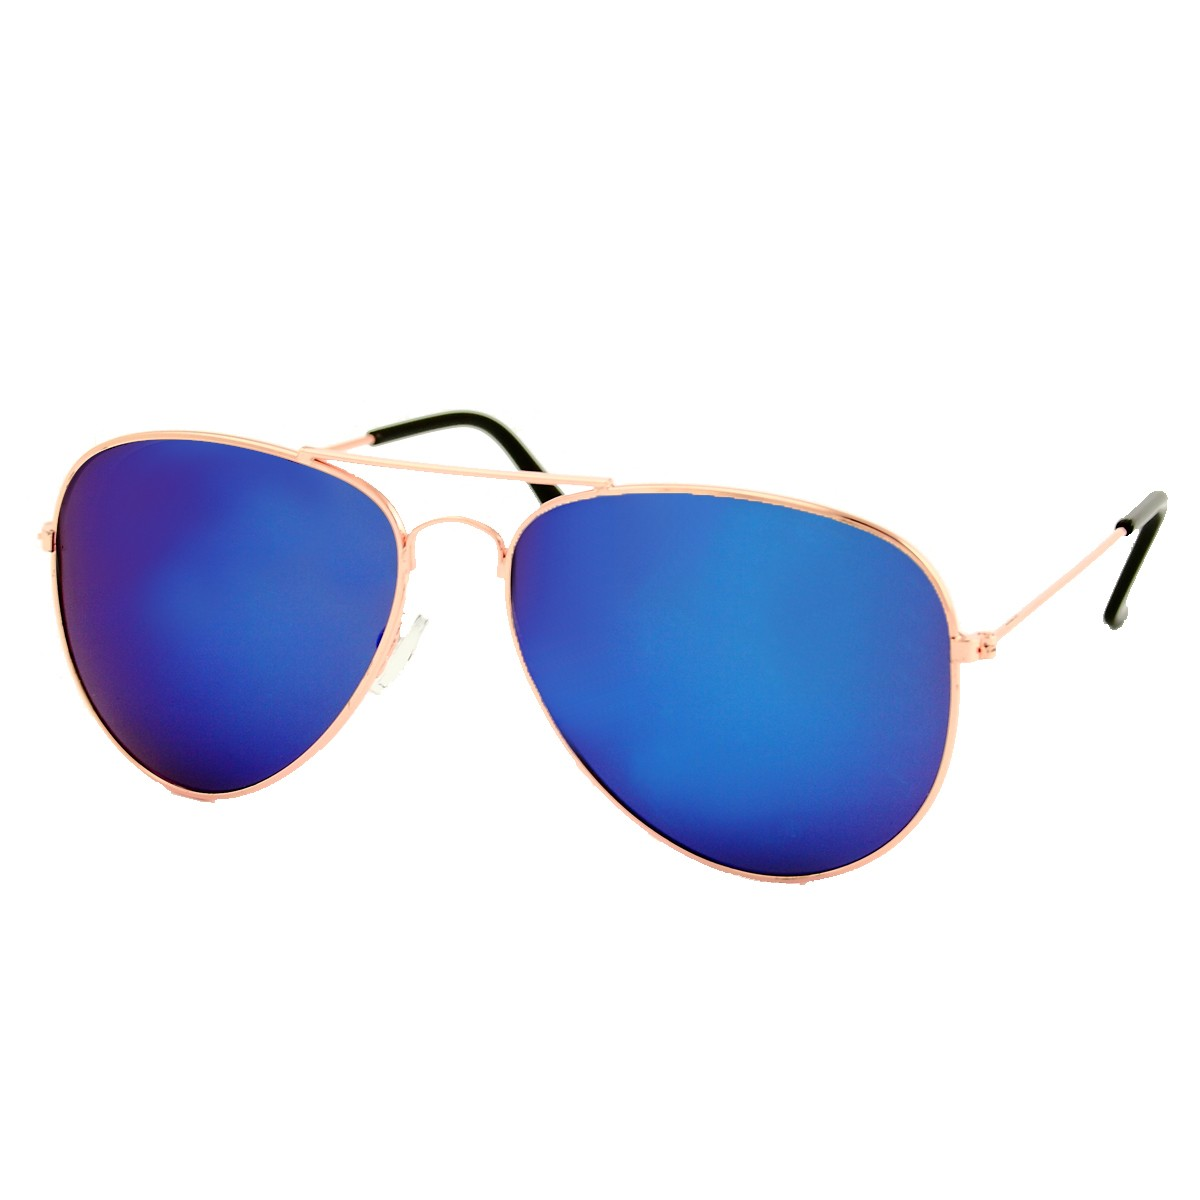 Gold aviator sunglasses - Blue purple mirror glass